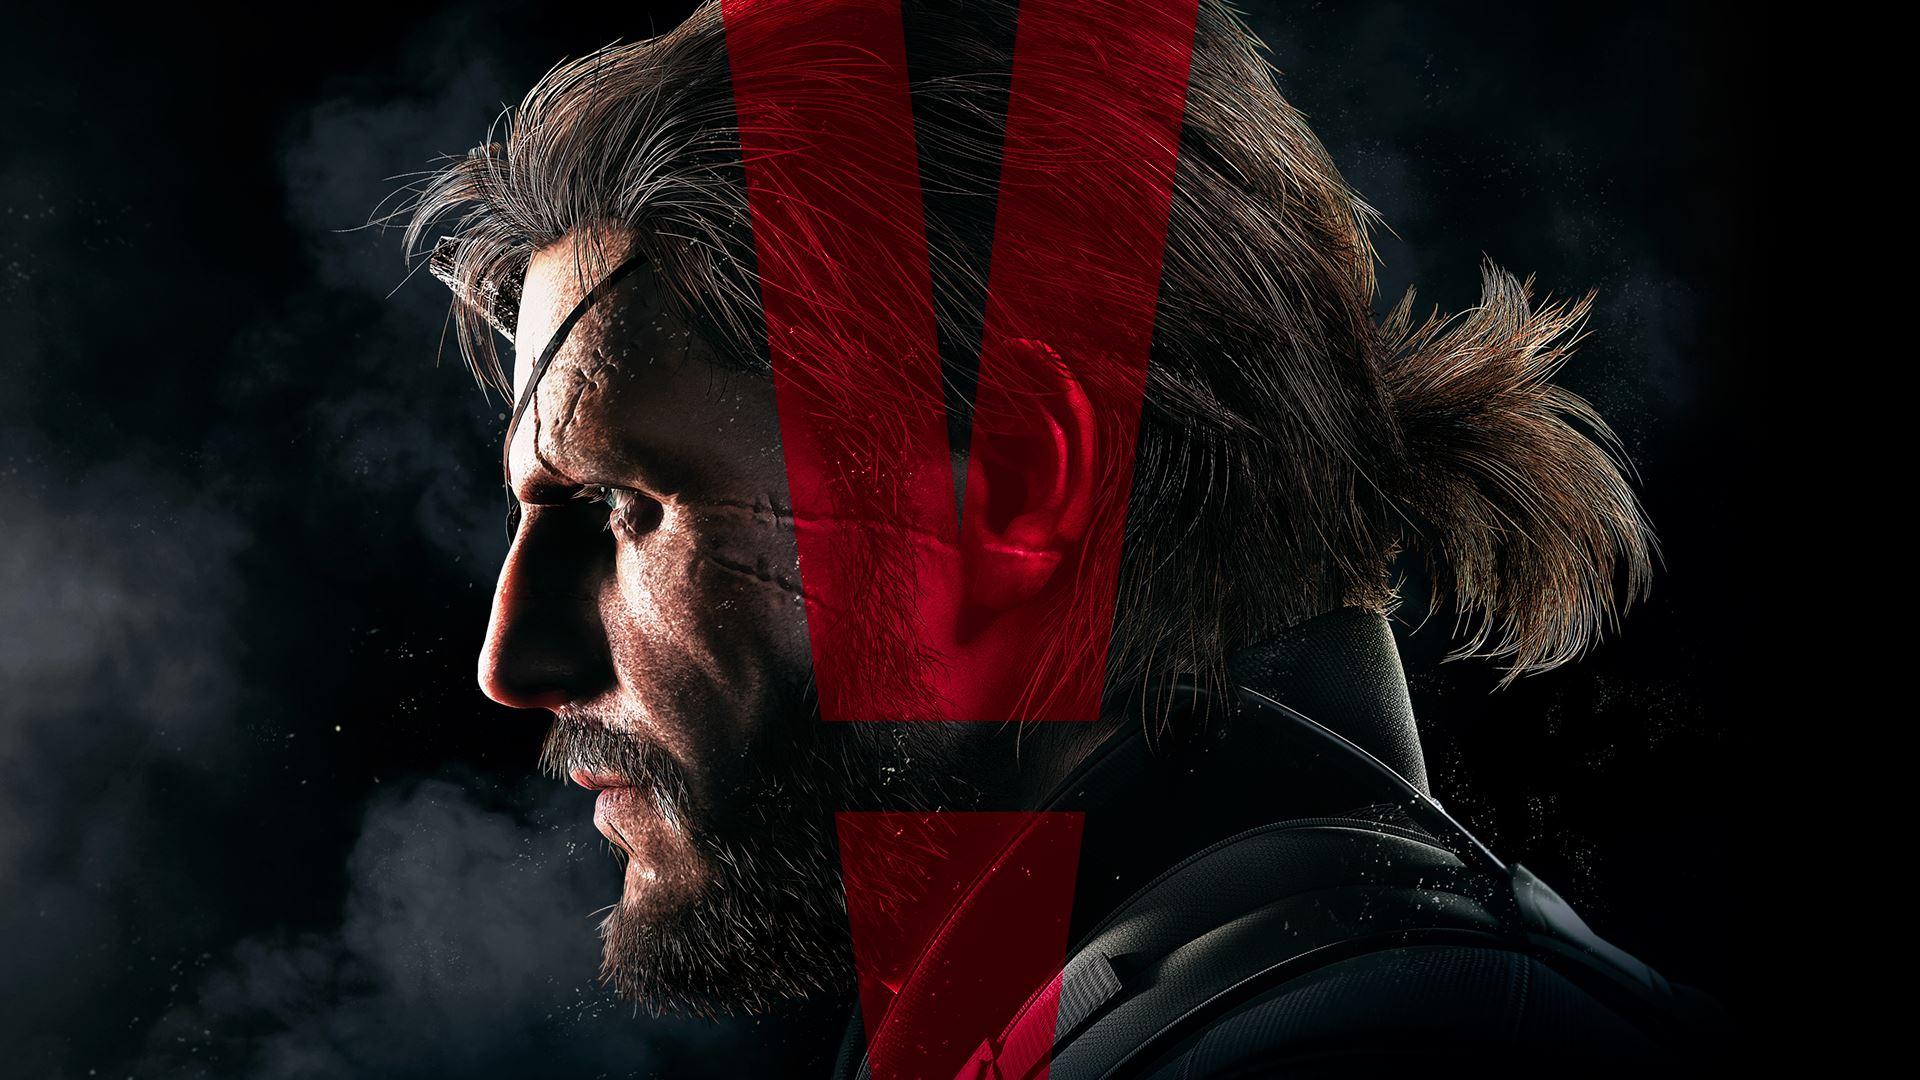 Big Boss Metal Gear Solid Metal Gear Solid V The Phantom Pain 1920x1080